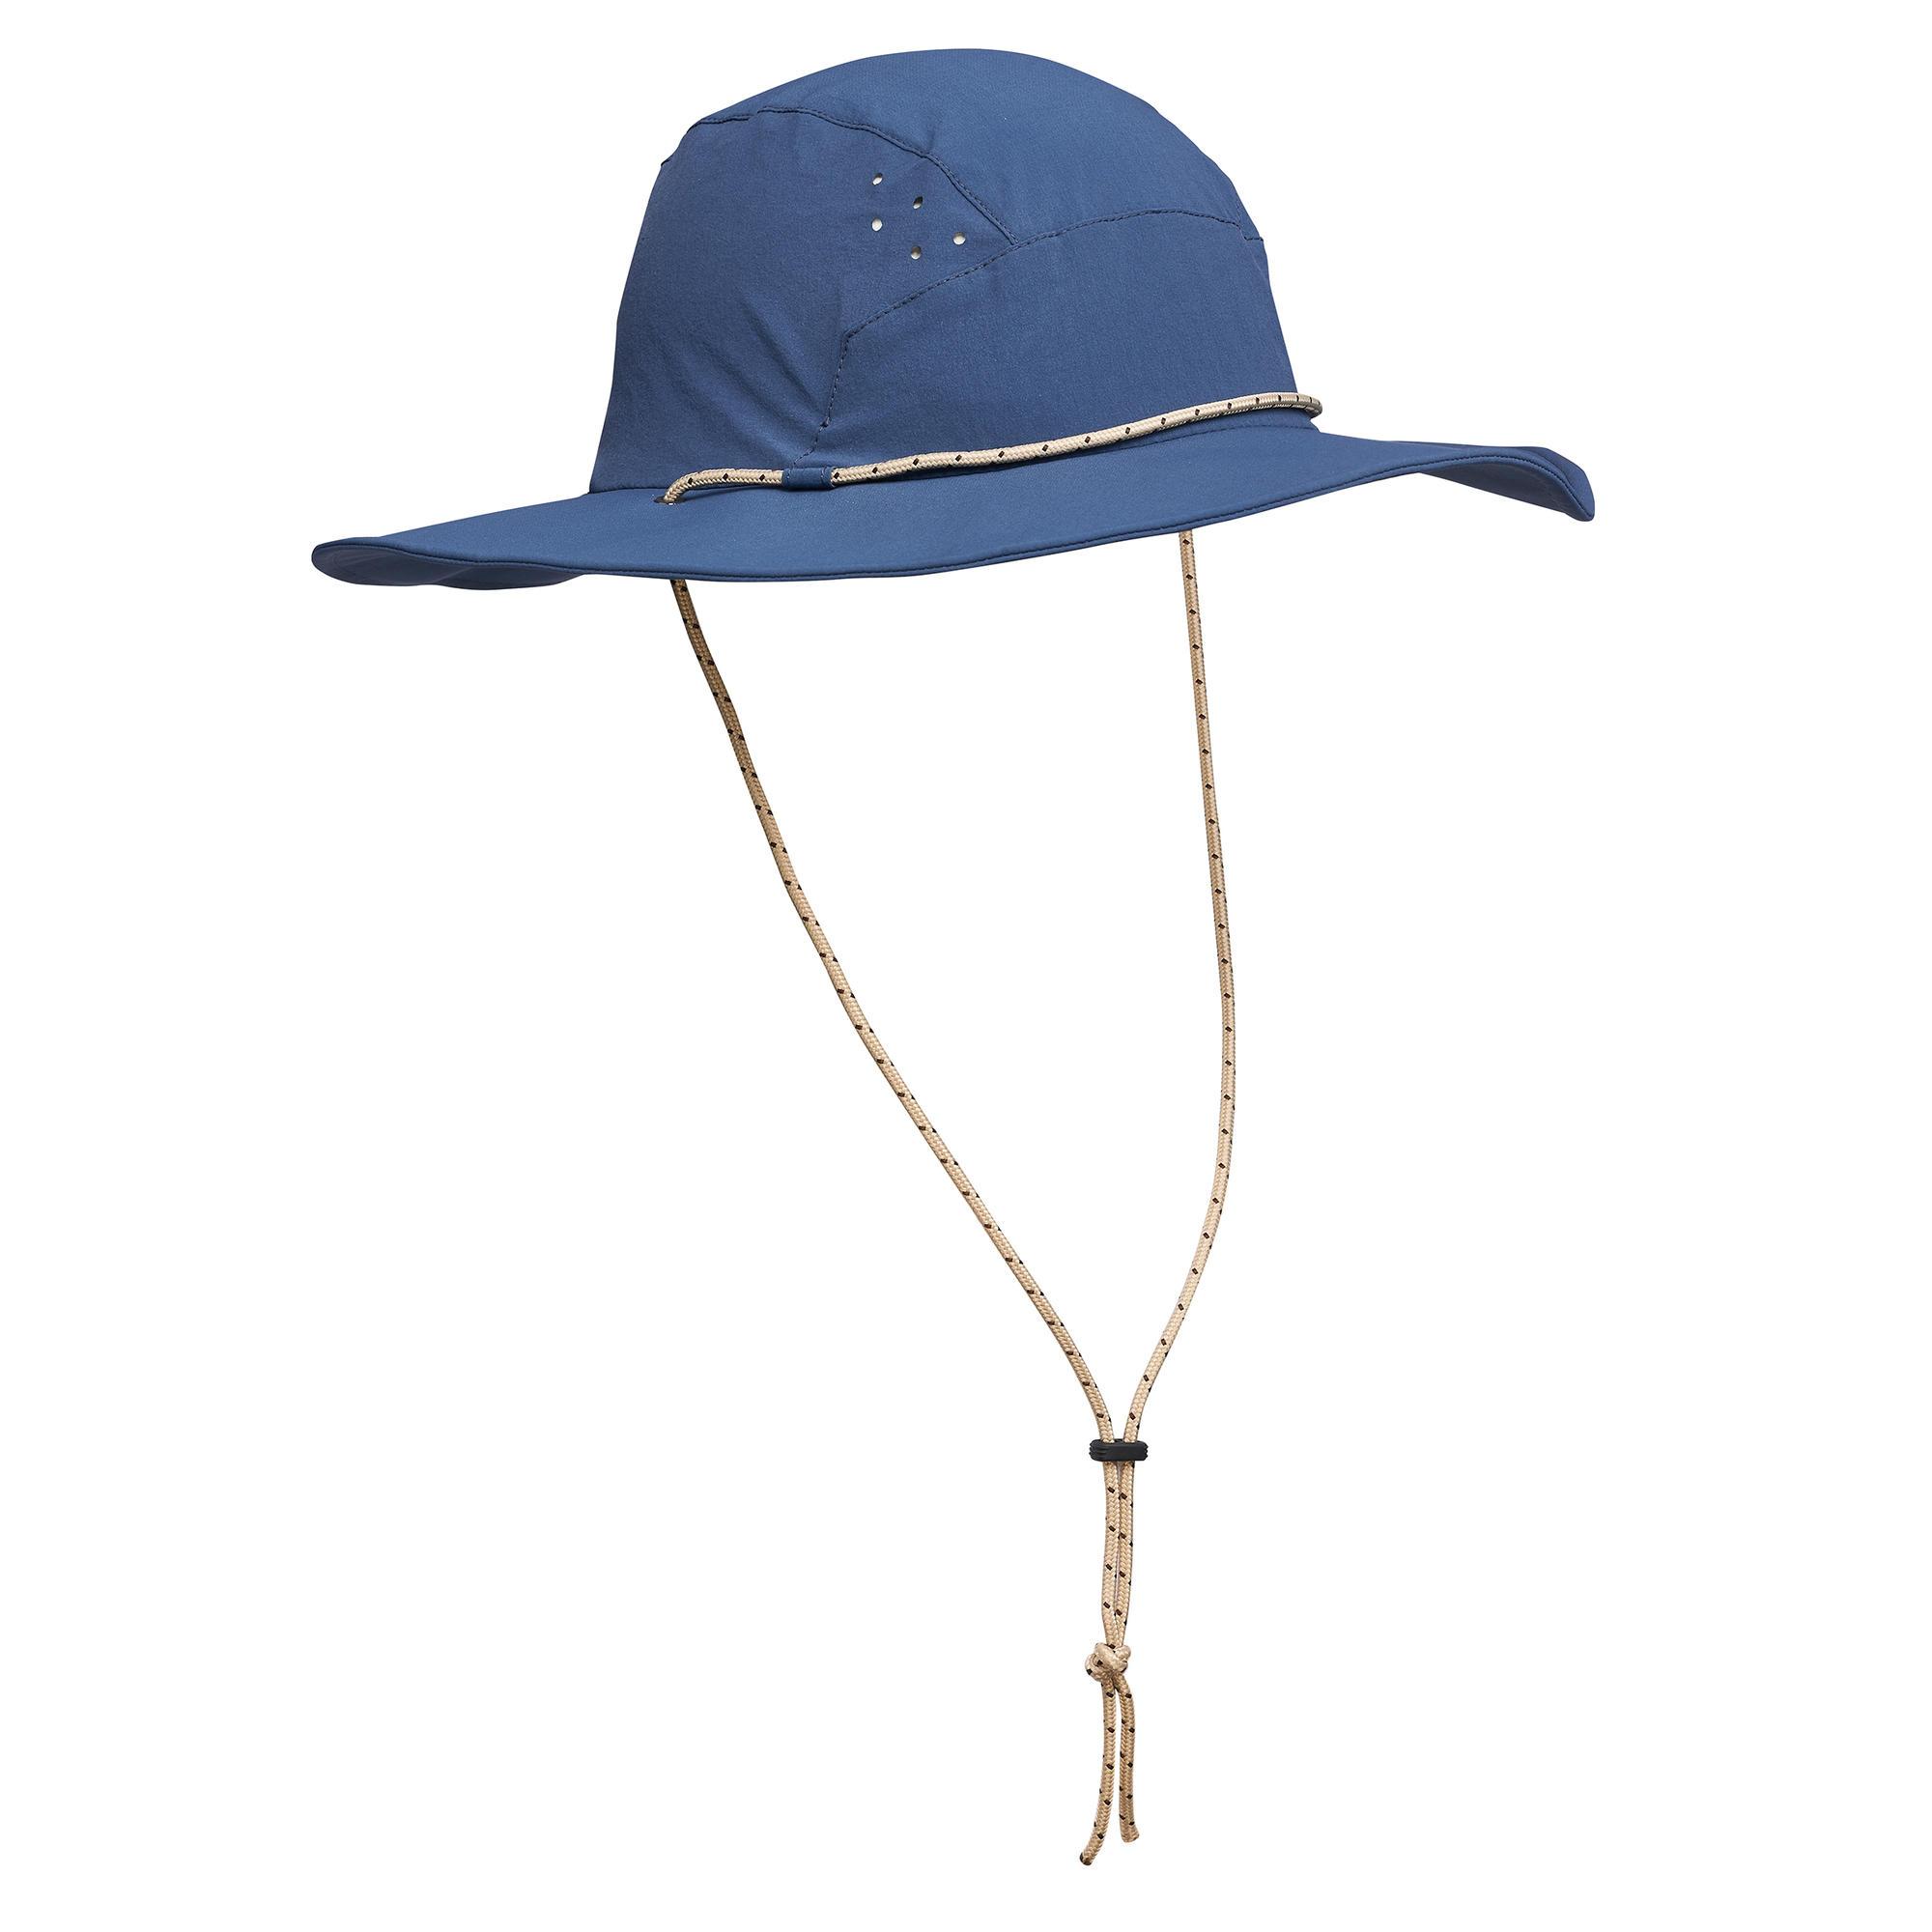 b59c3940865 Trek 500 Men's Mountain Trekking Anti-UV Hat - Blue | forclaz